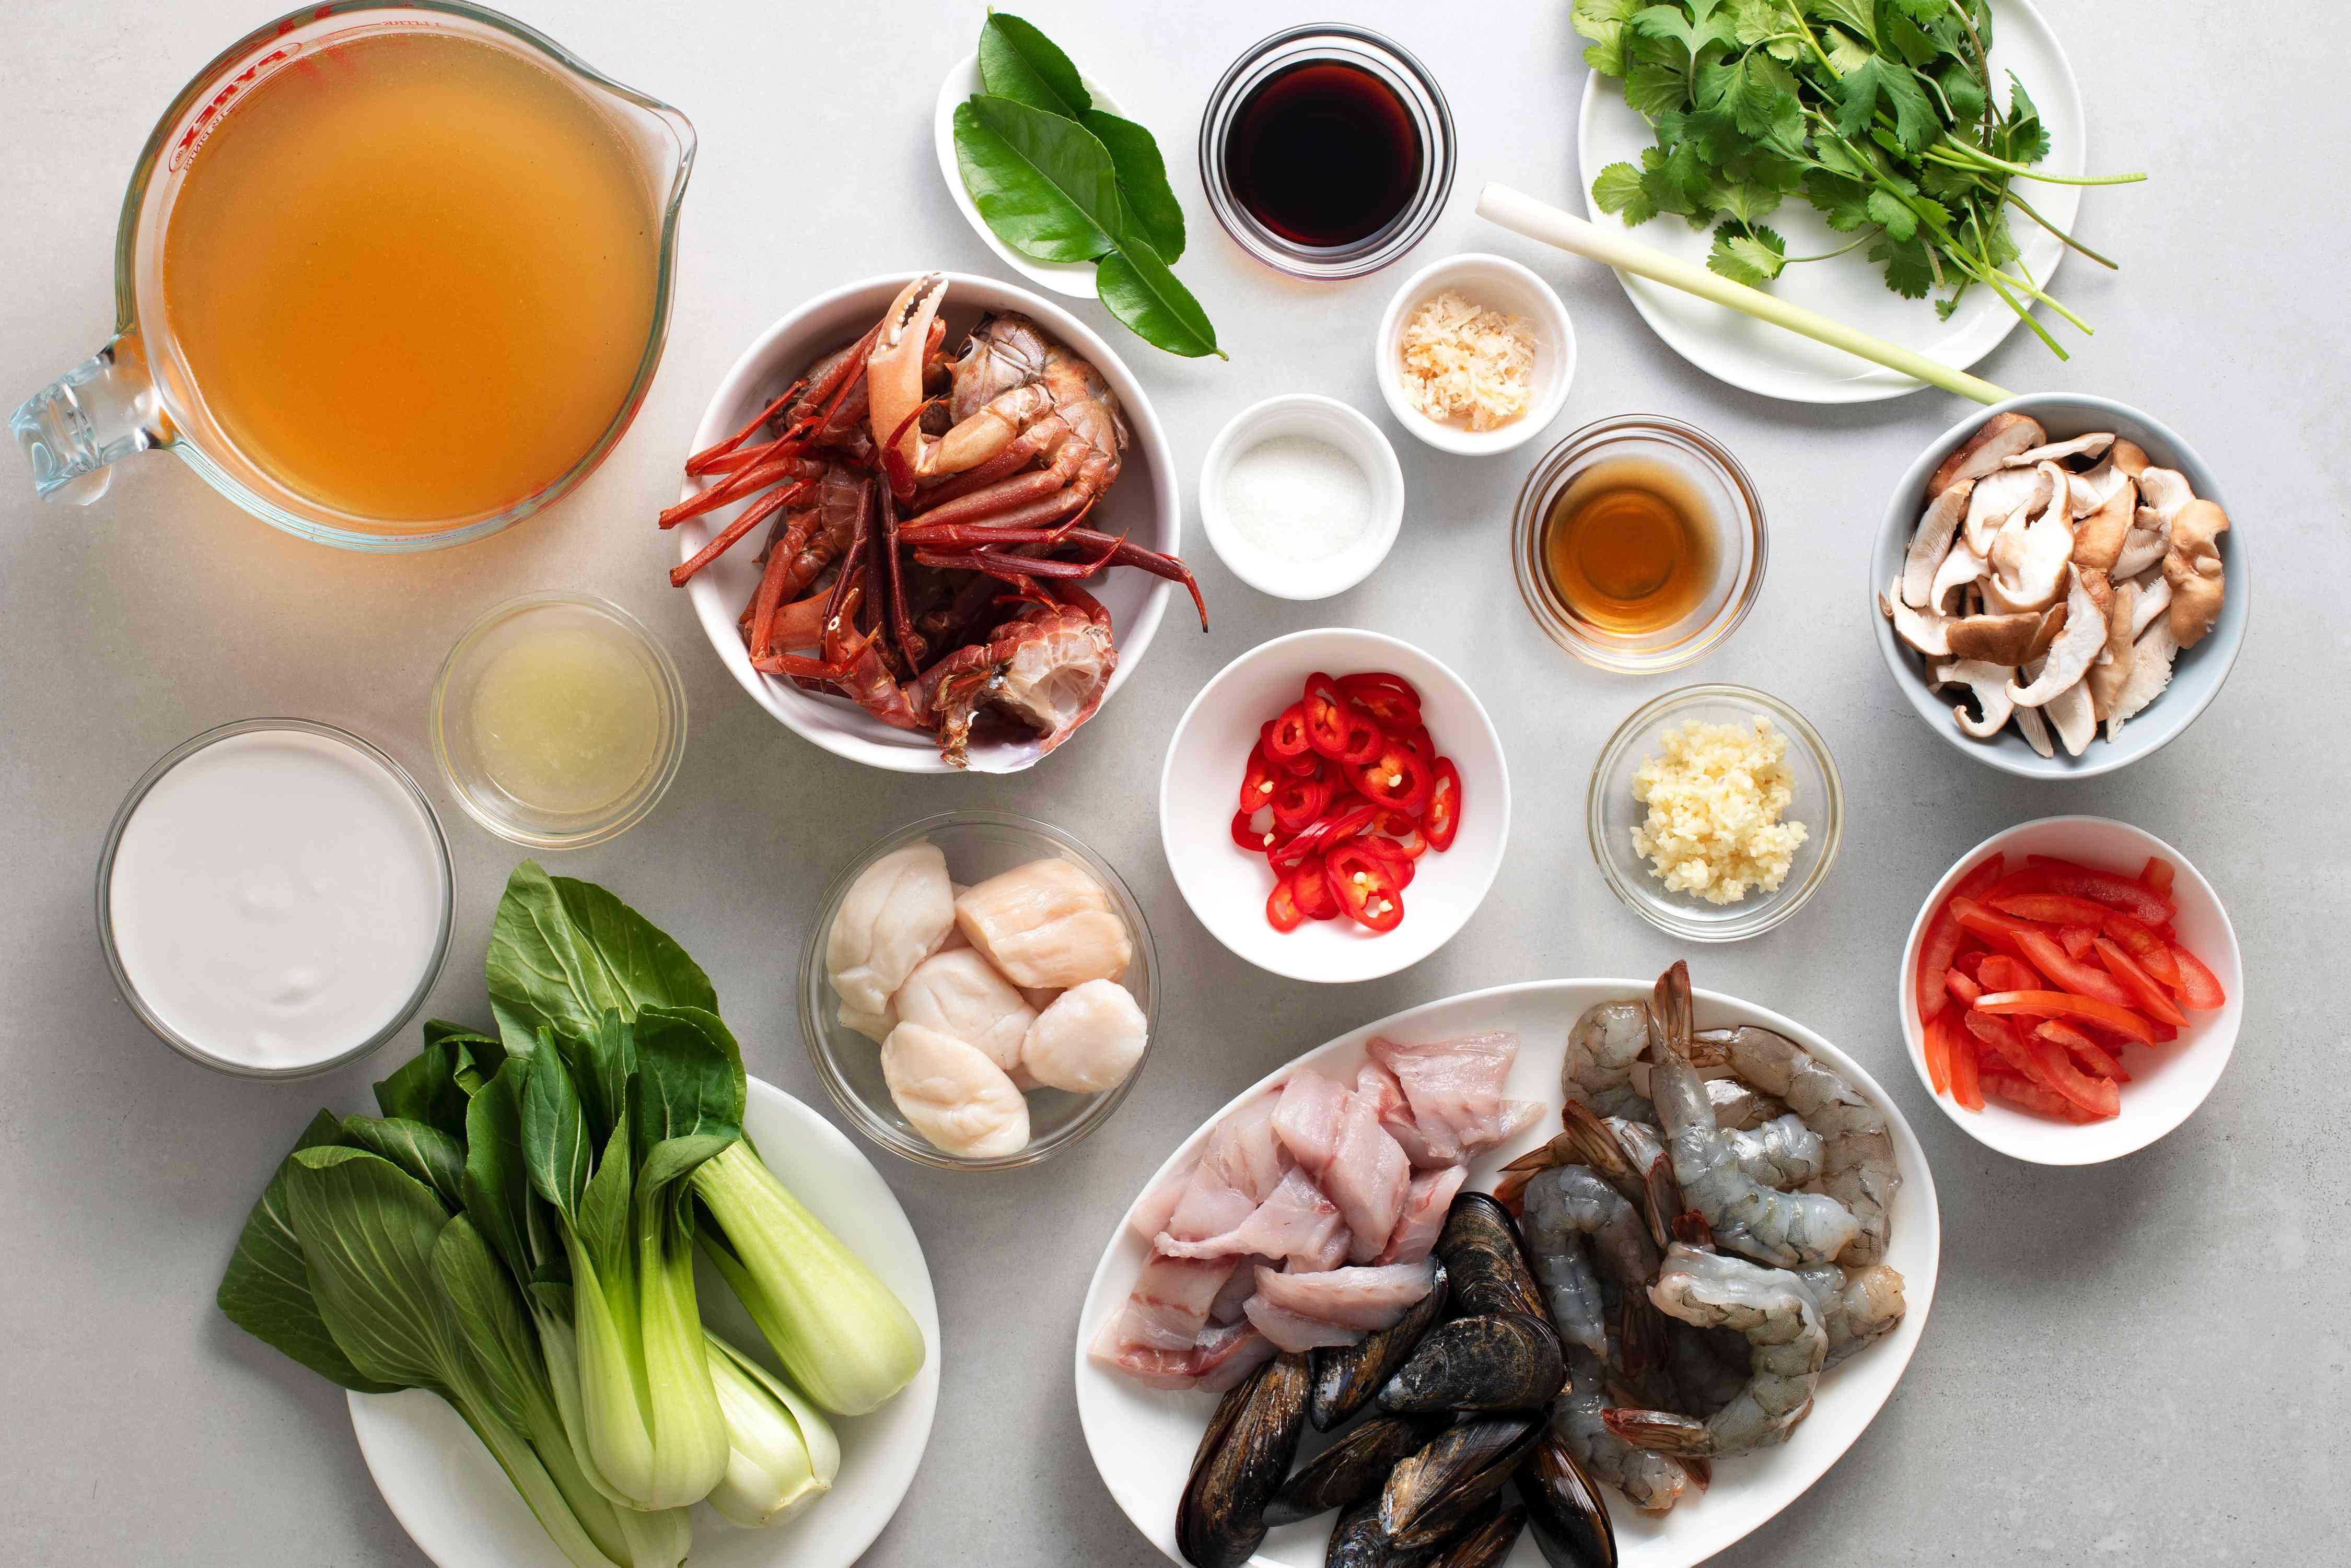 Ingredients to make Tom Yum Talay soup